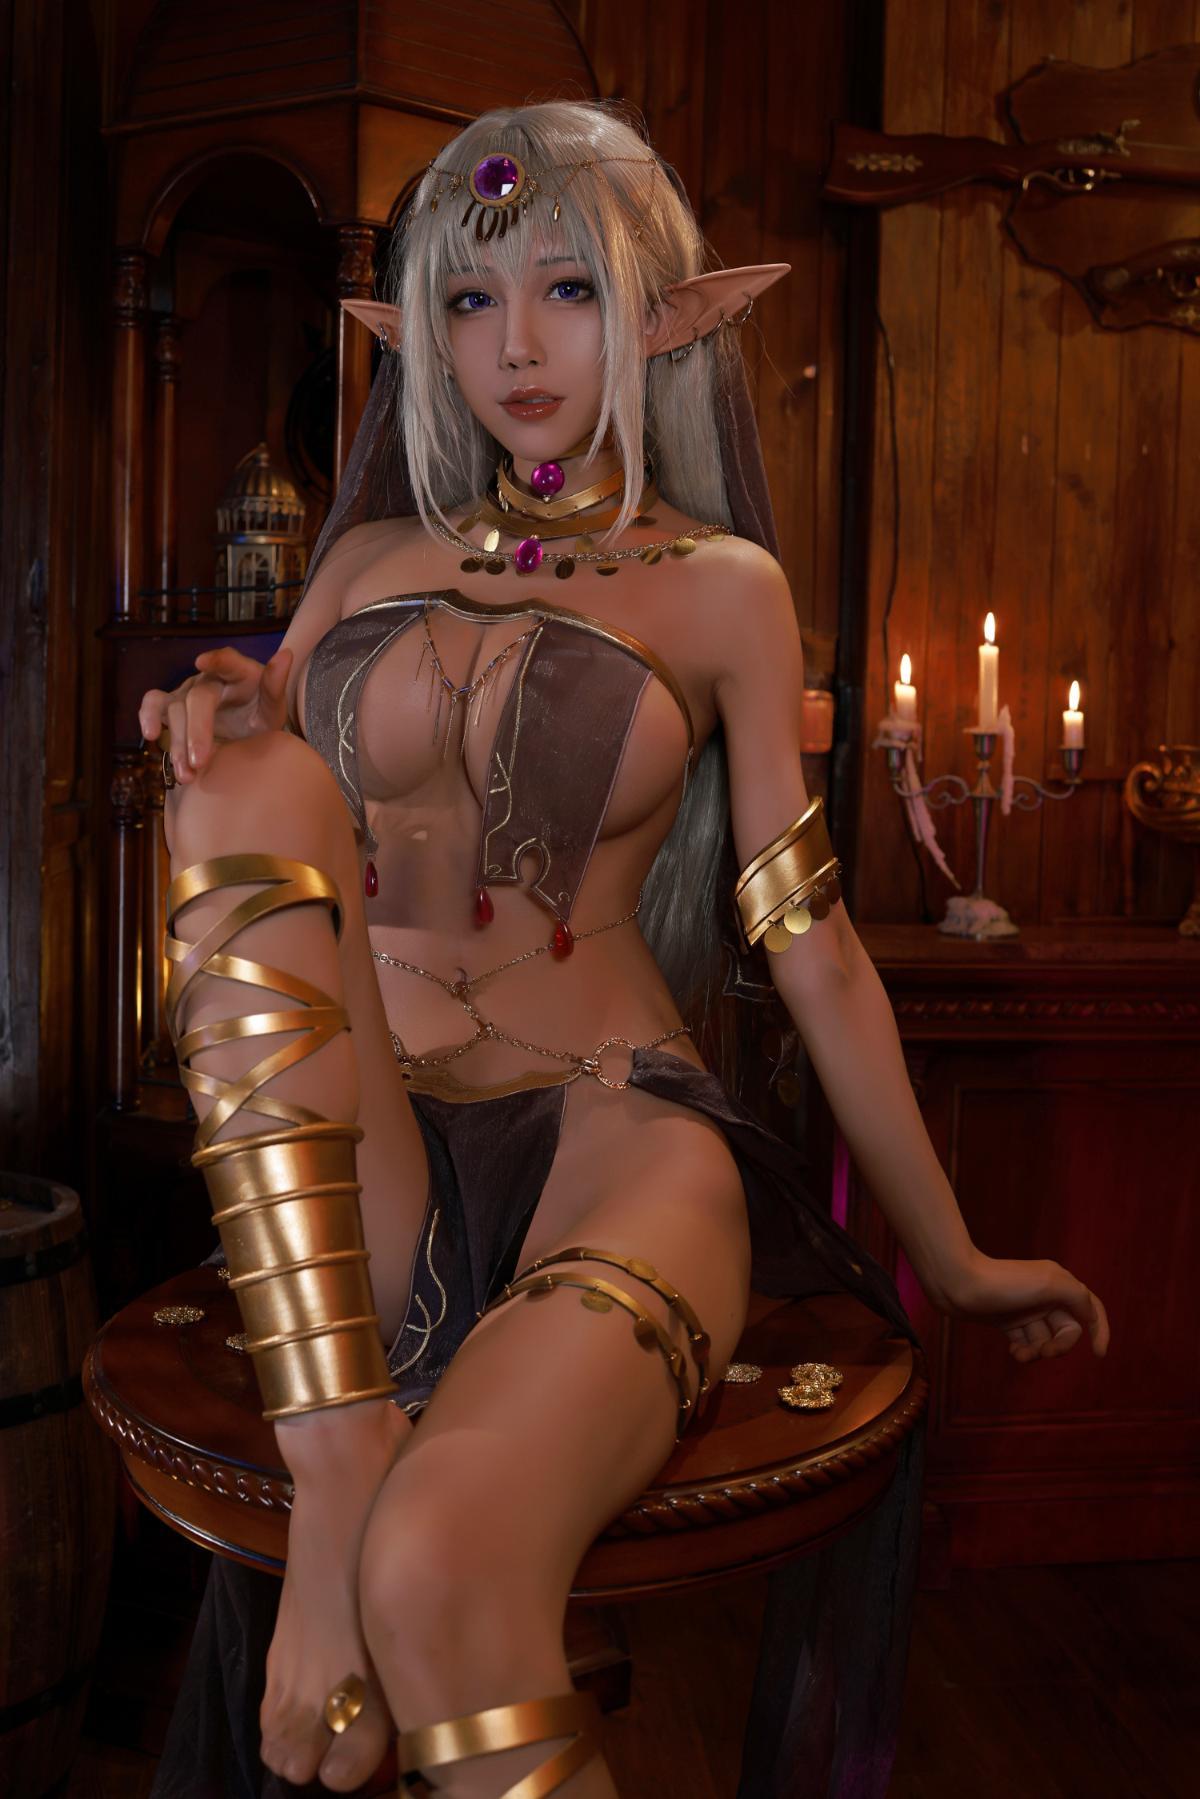 Tan Dancer Elf Succubus Cosplay by Aqua 1